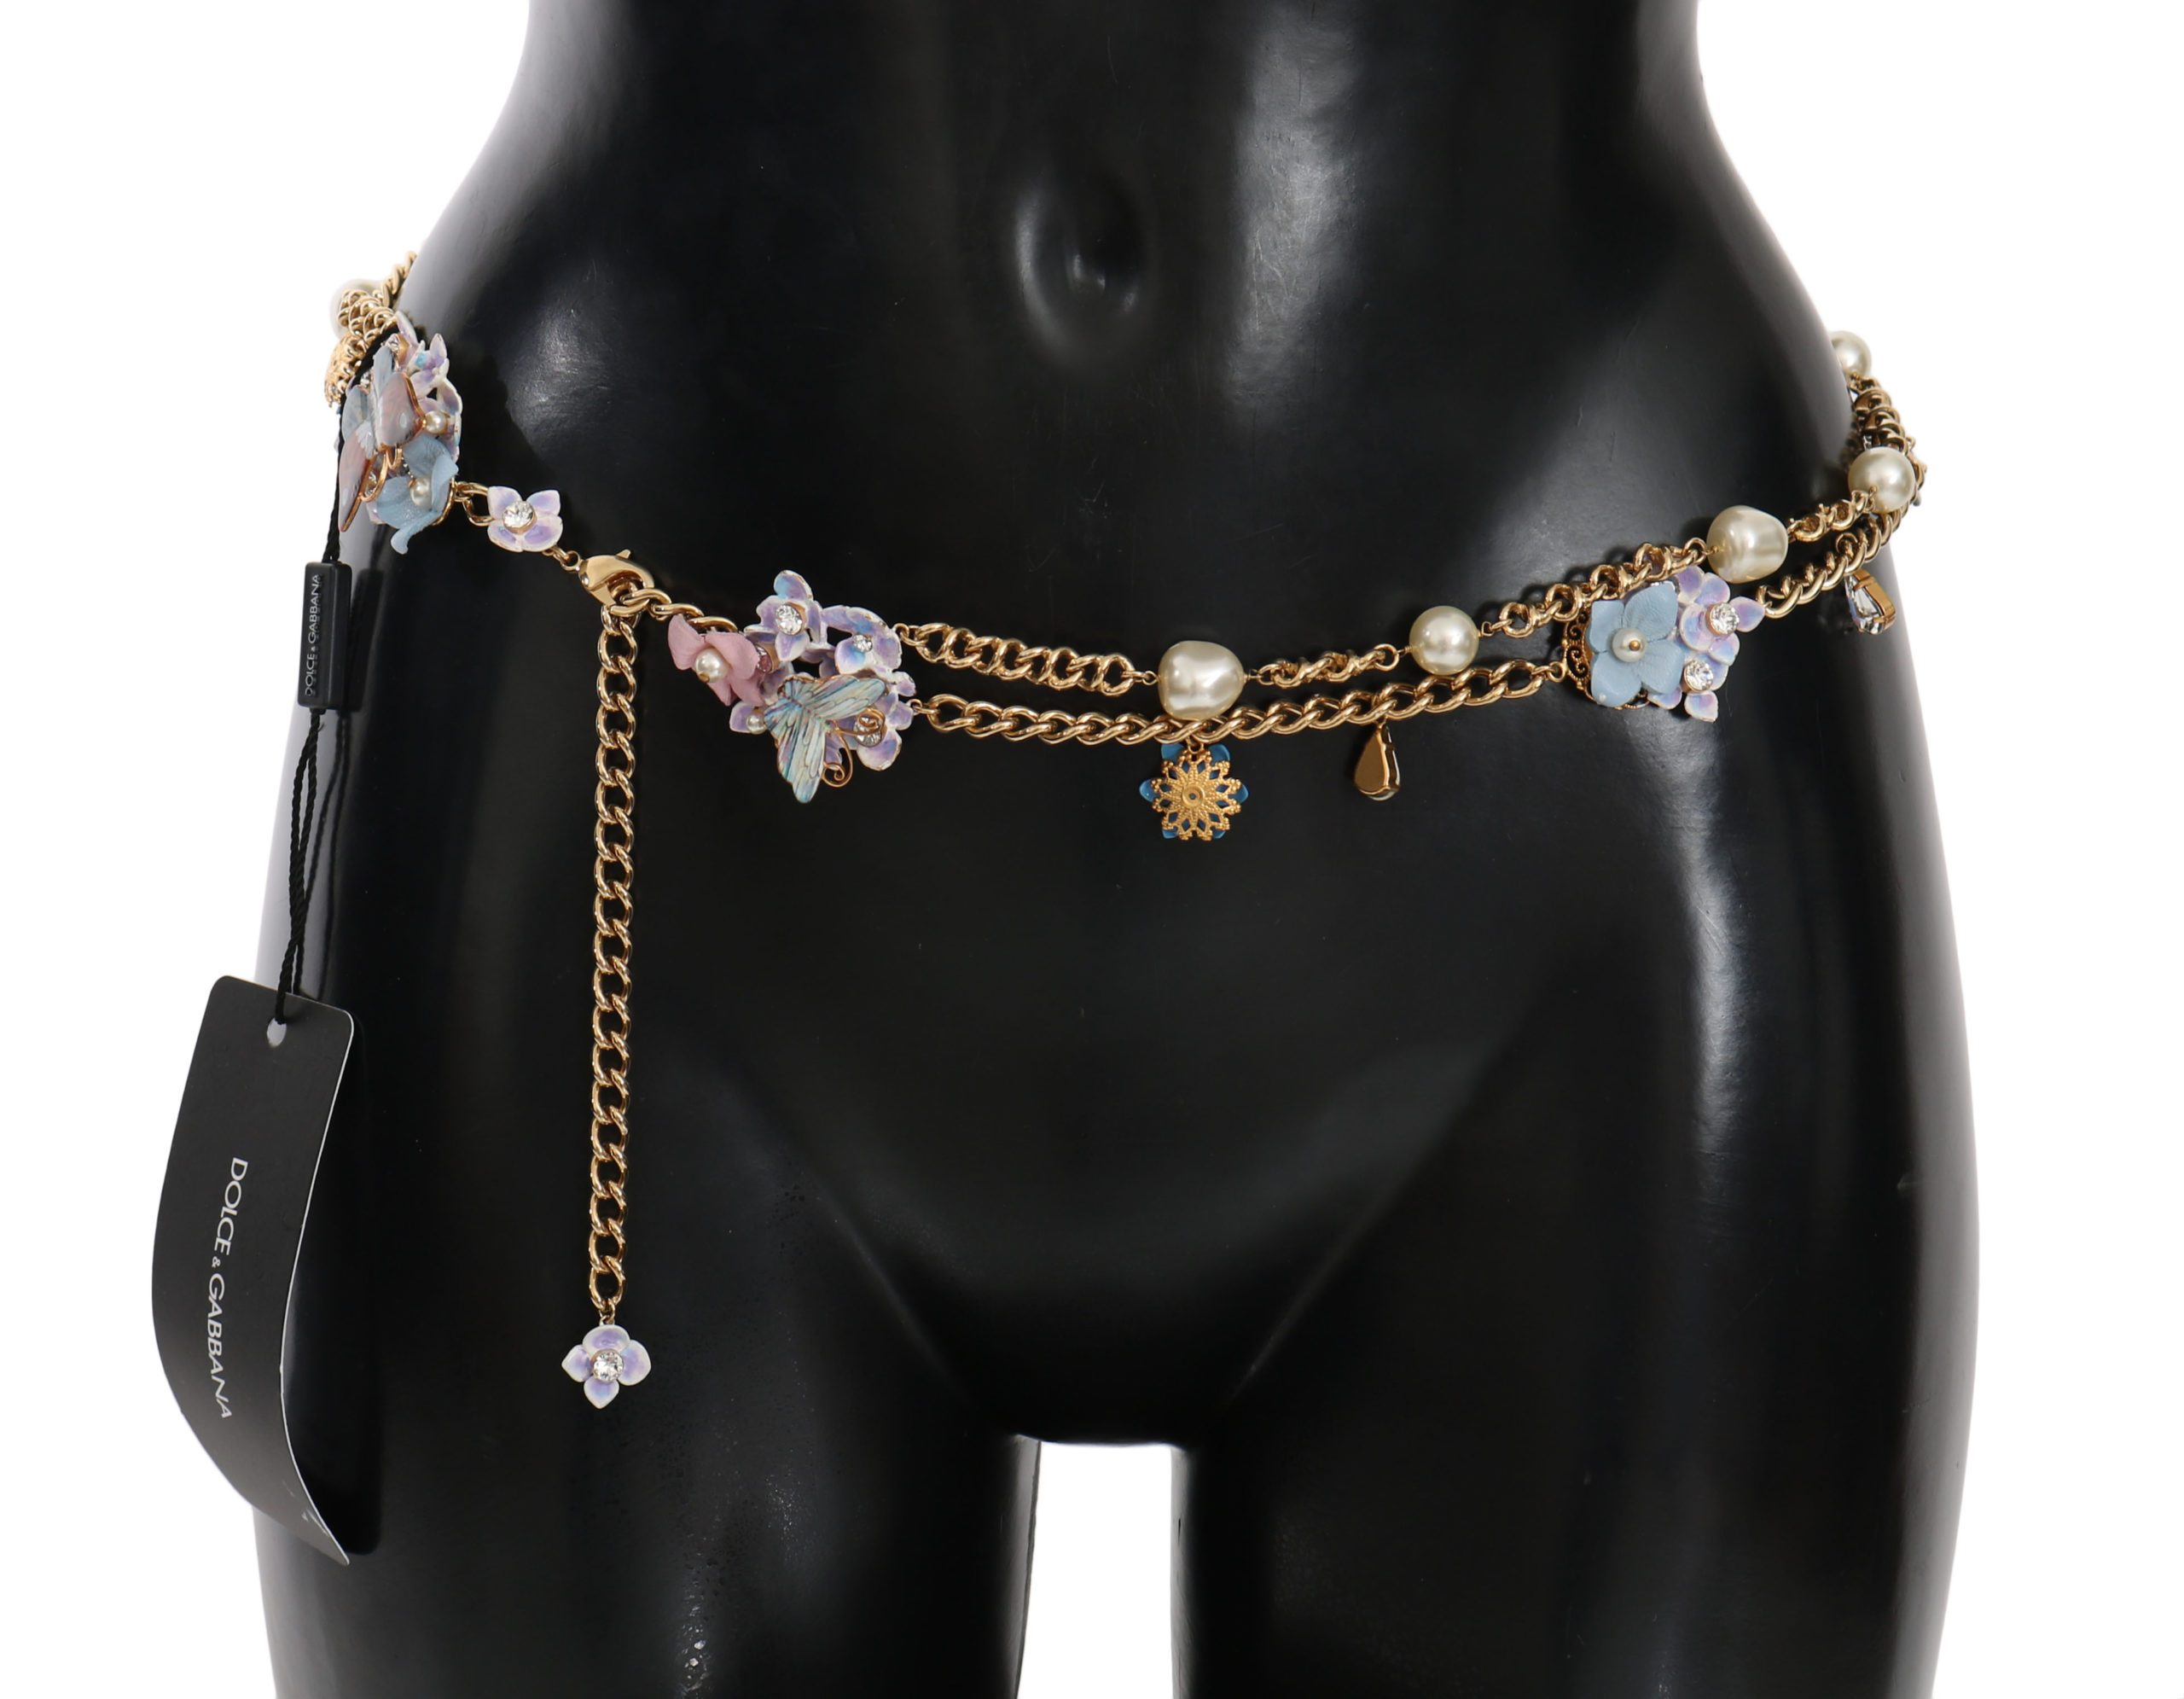 Dolce & Gabbana Women's Chain Crystal Butterfly Flower Belt Gold SMYK1032 - 85 cm / 34 Inches